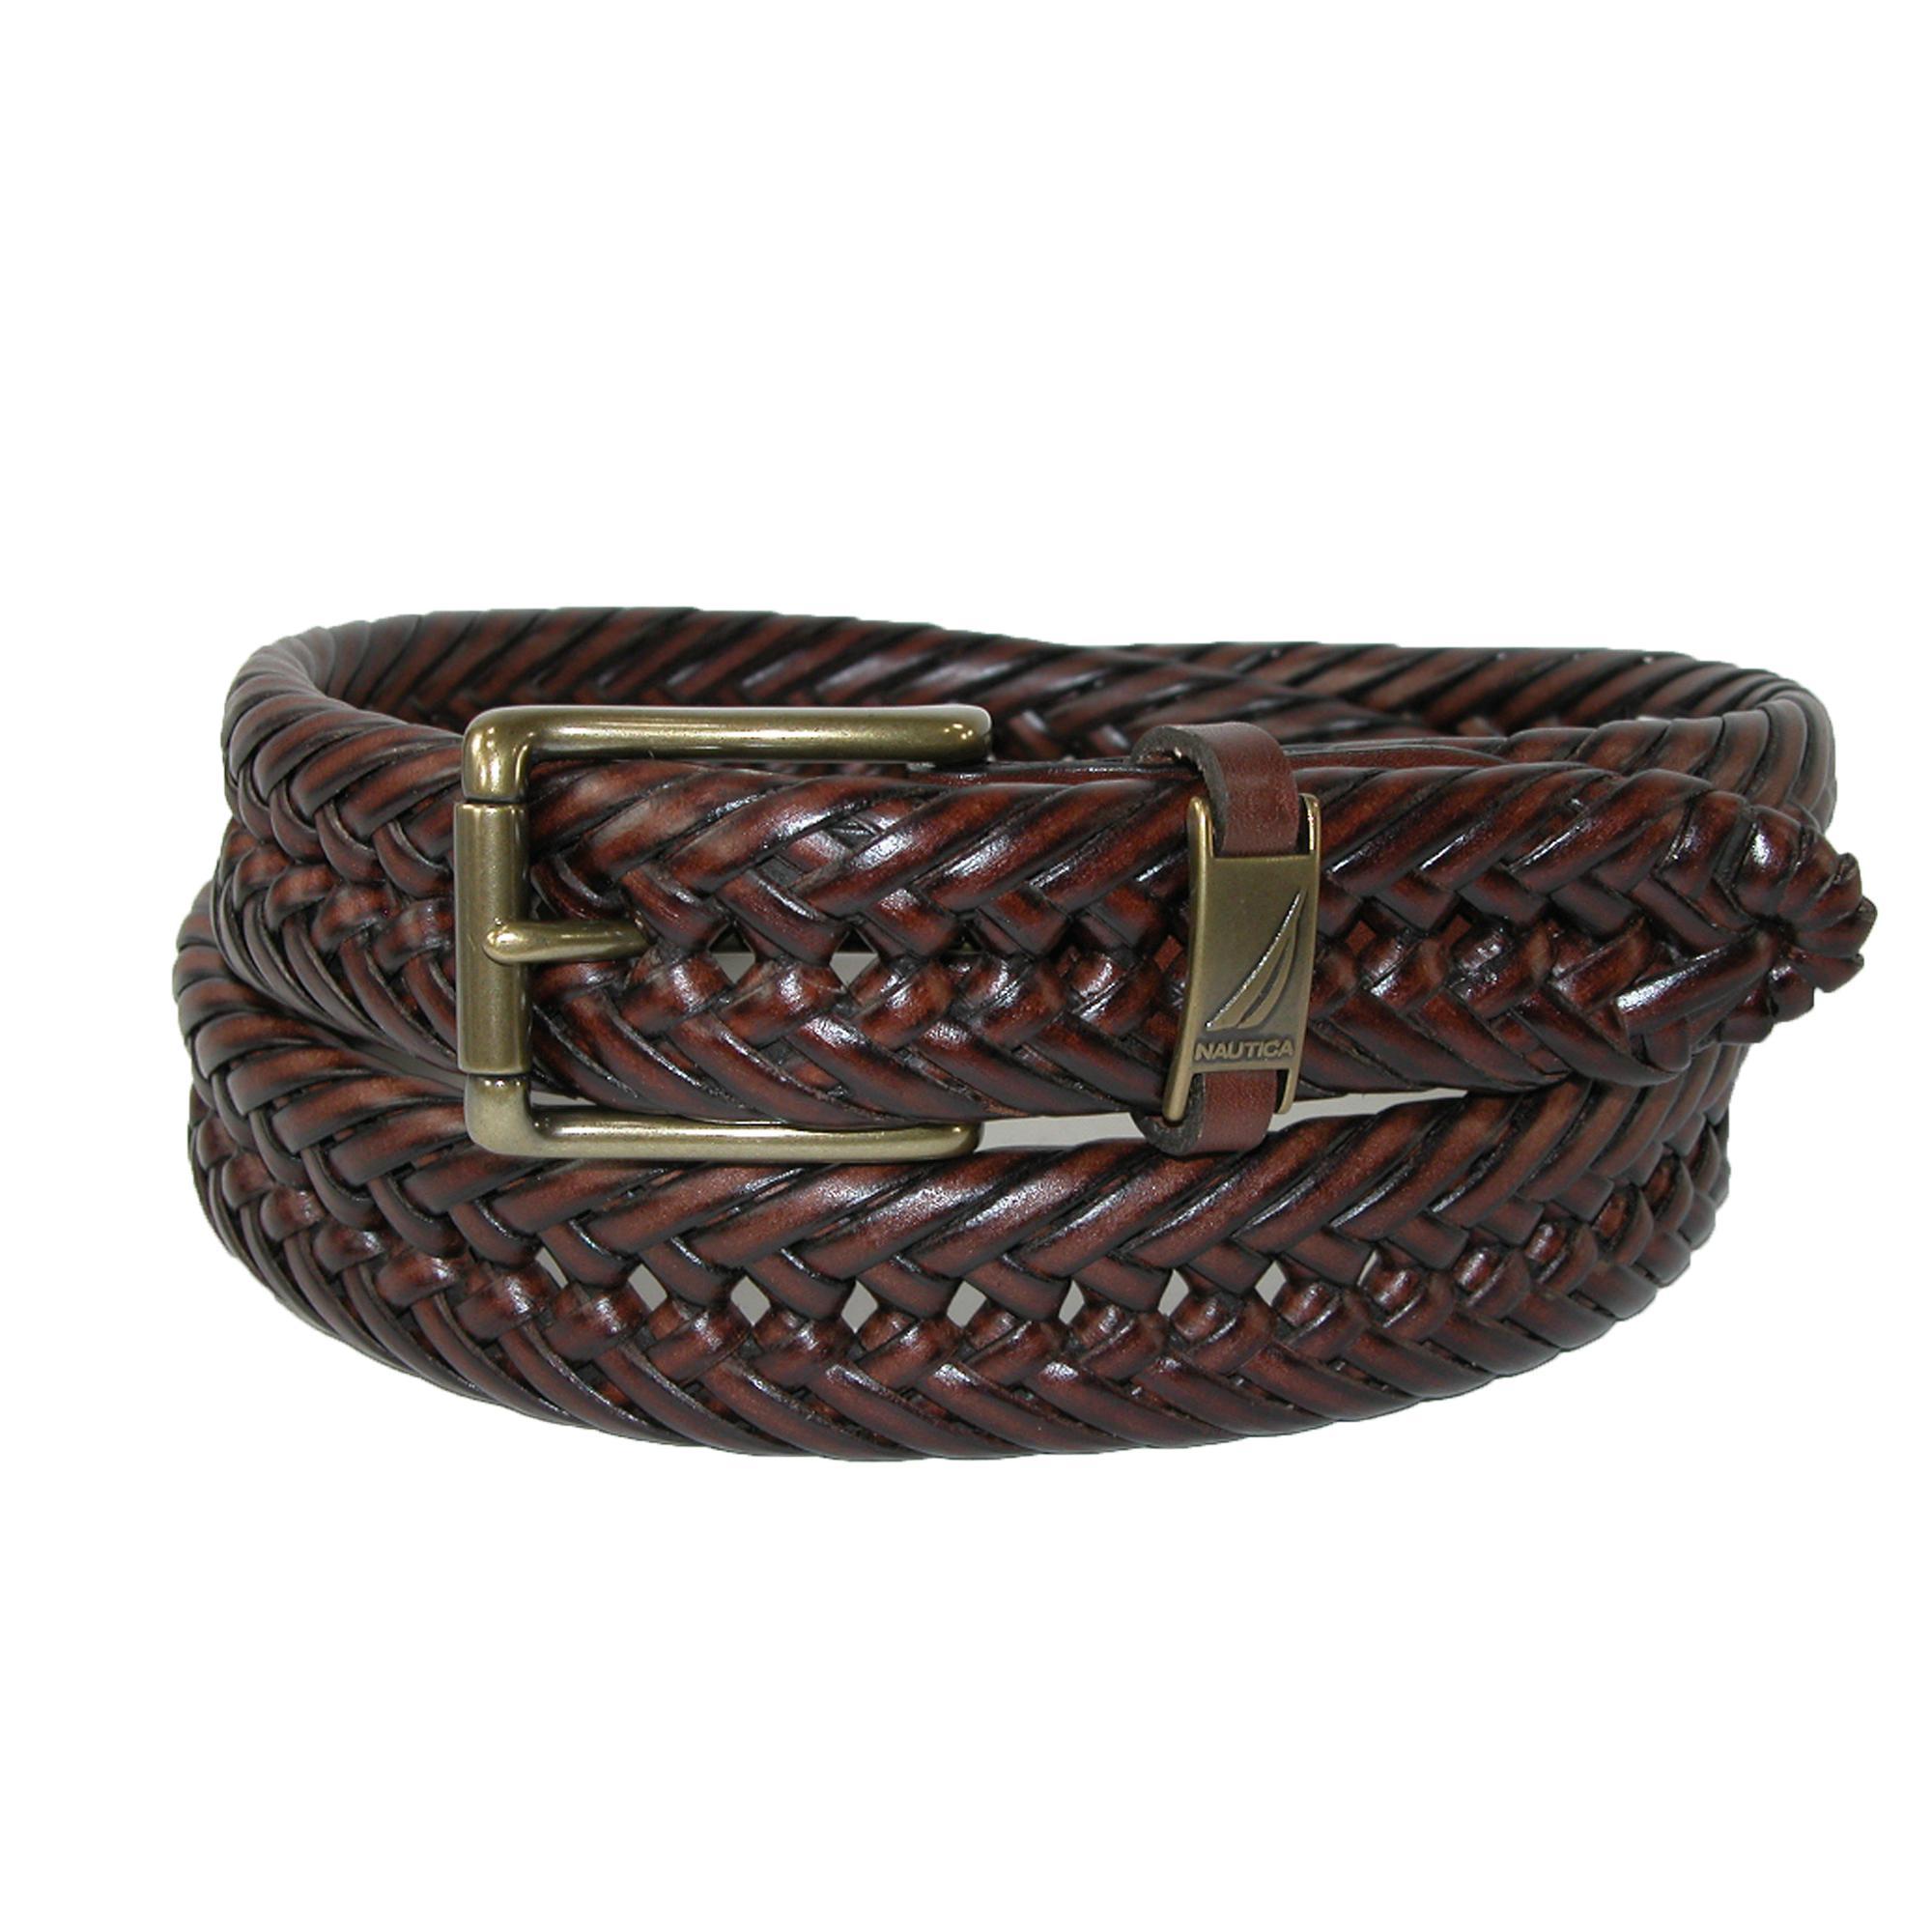 Nautica Mens Big & Tall Leather Handlaced Basket Weave Braided Belt